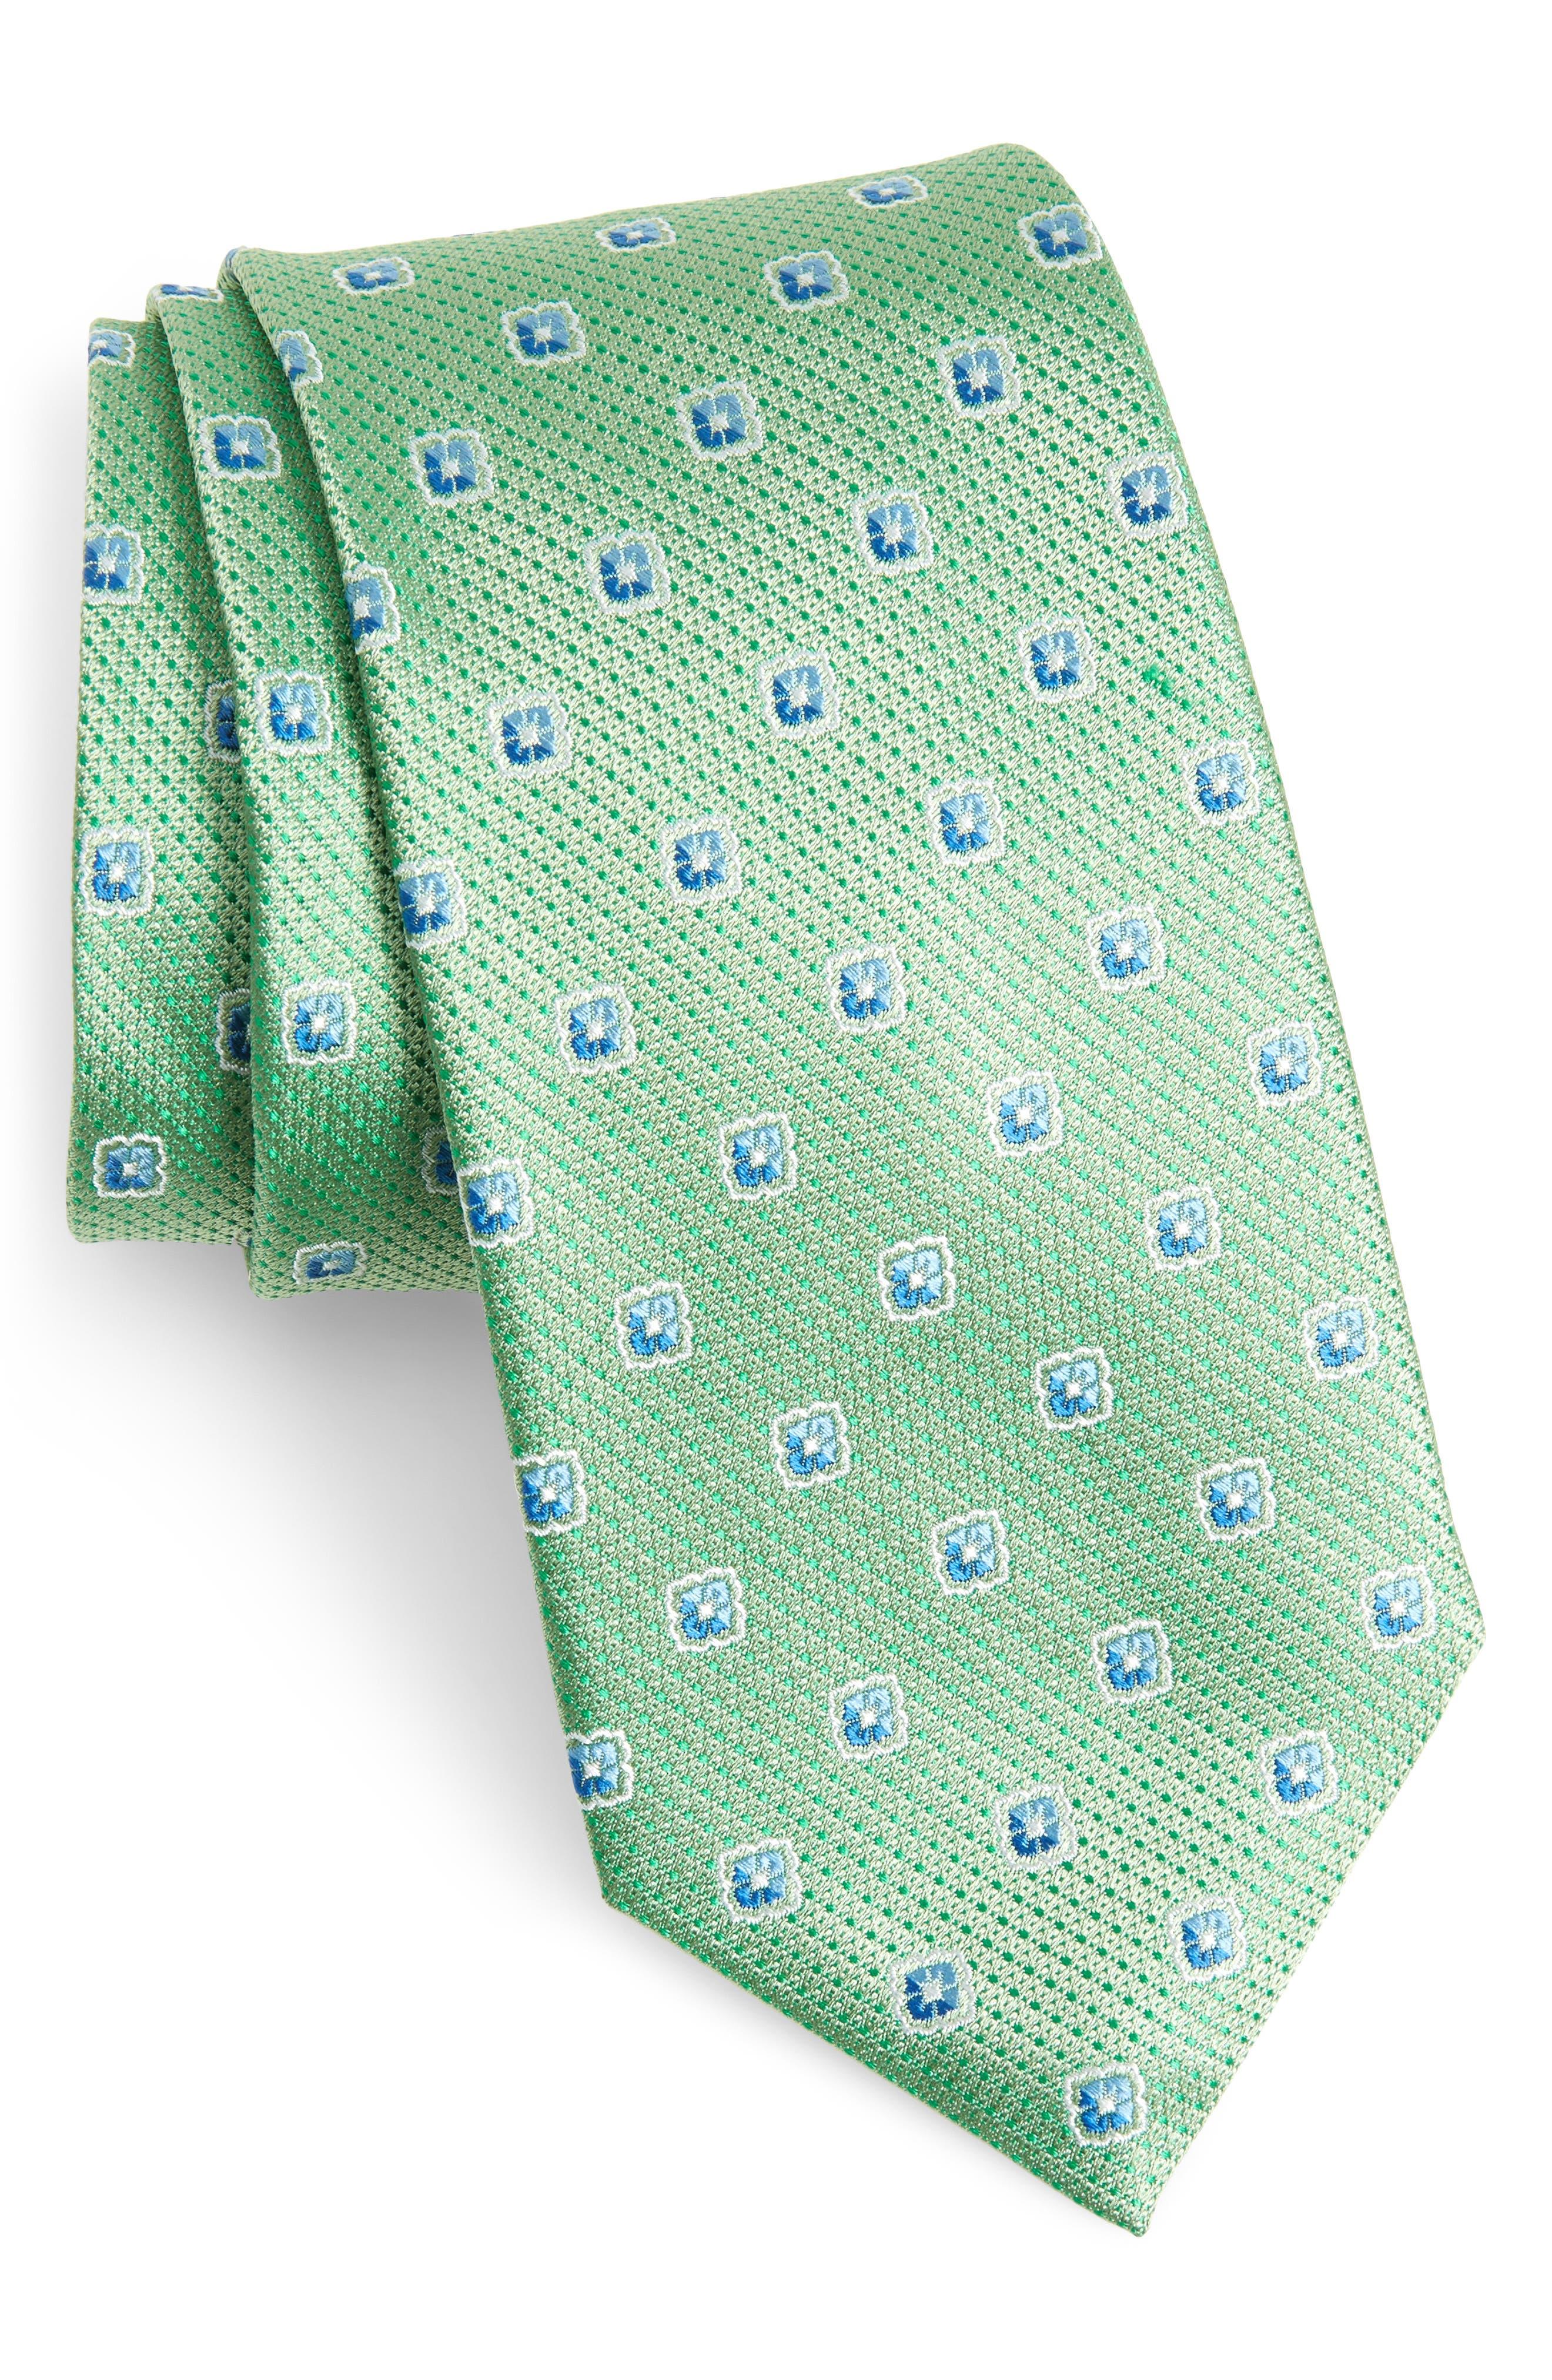 Leary Medallion Silk Tie,                         Main,                         color,